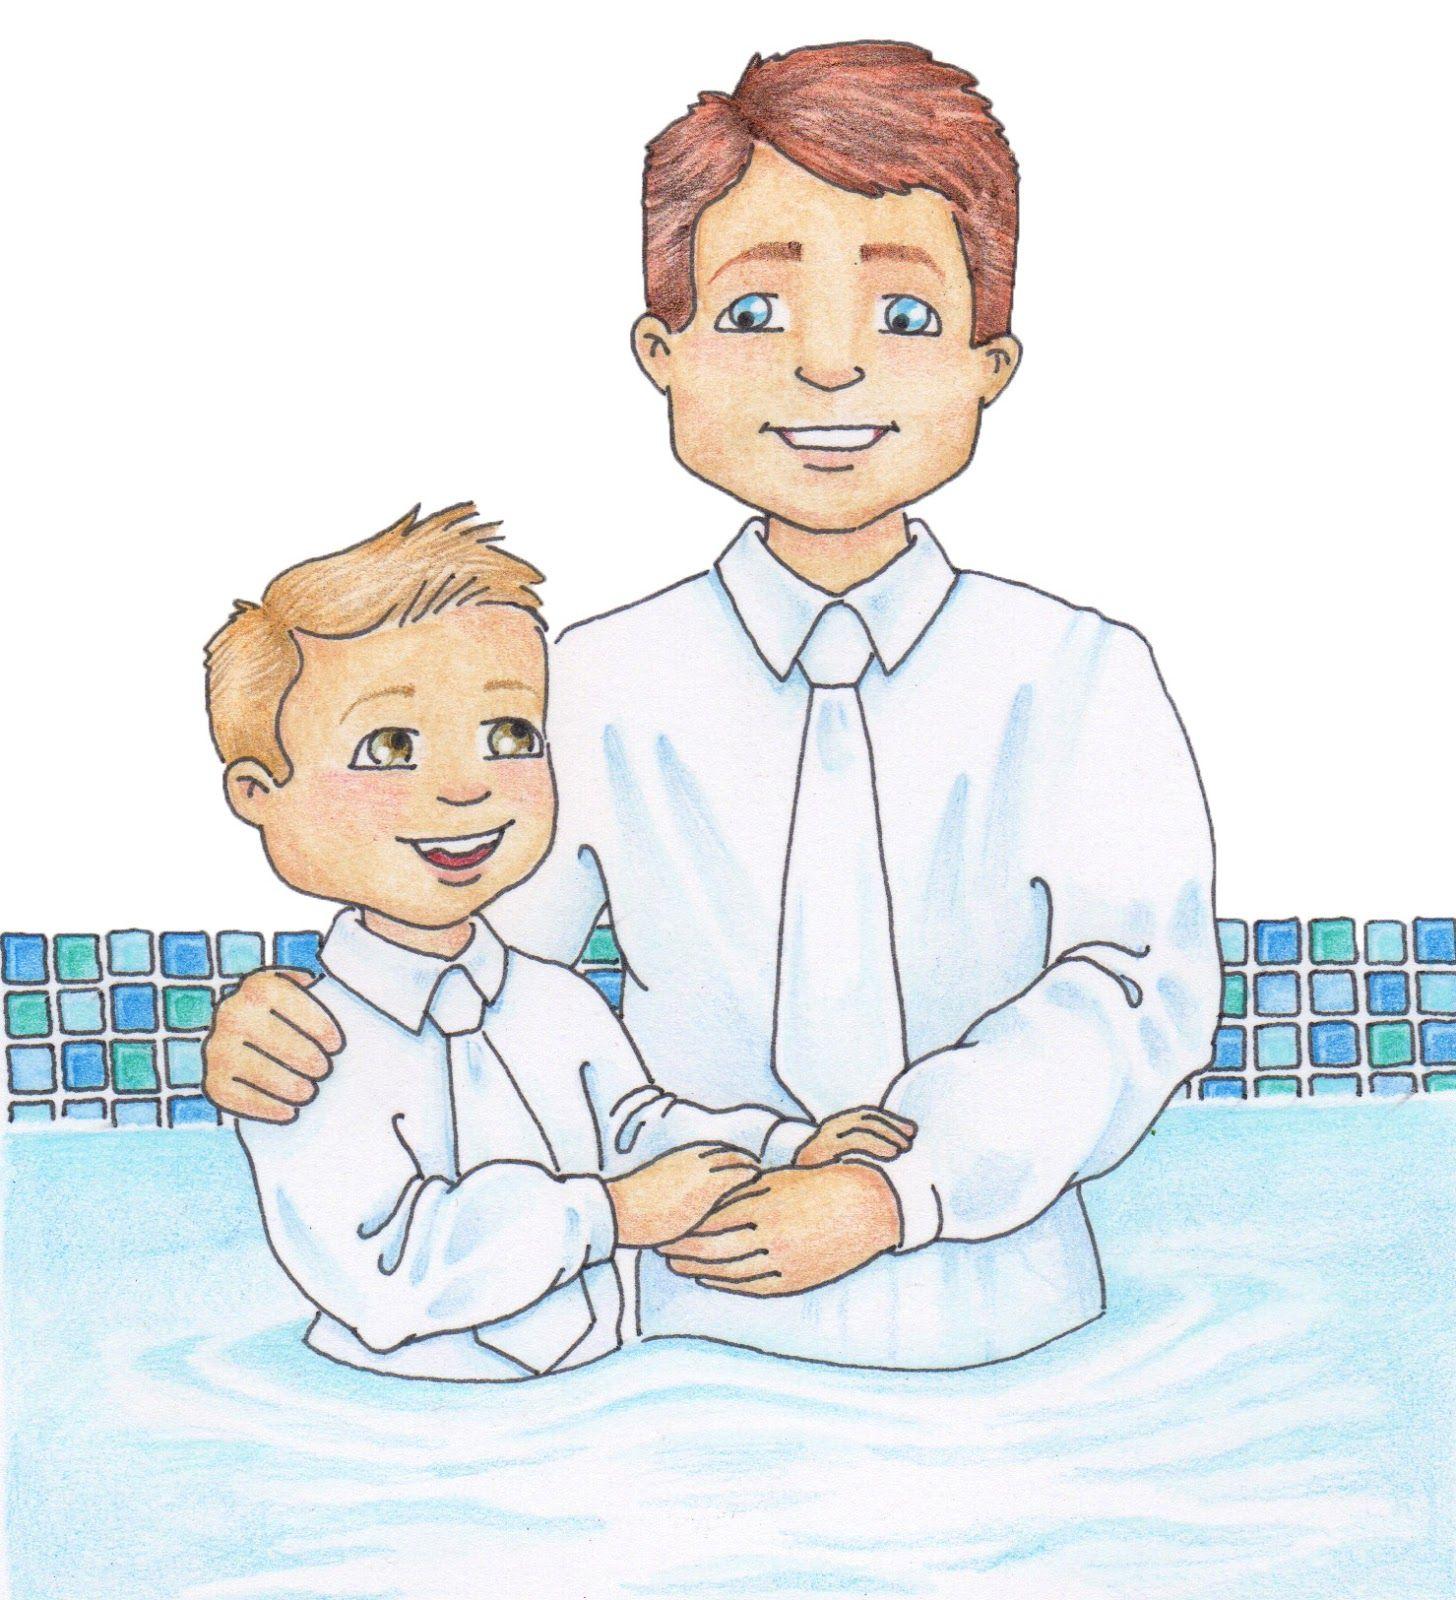 Lds clipart illustration. Susan fitch design baptism